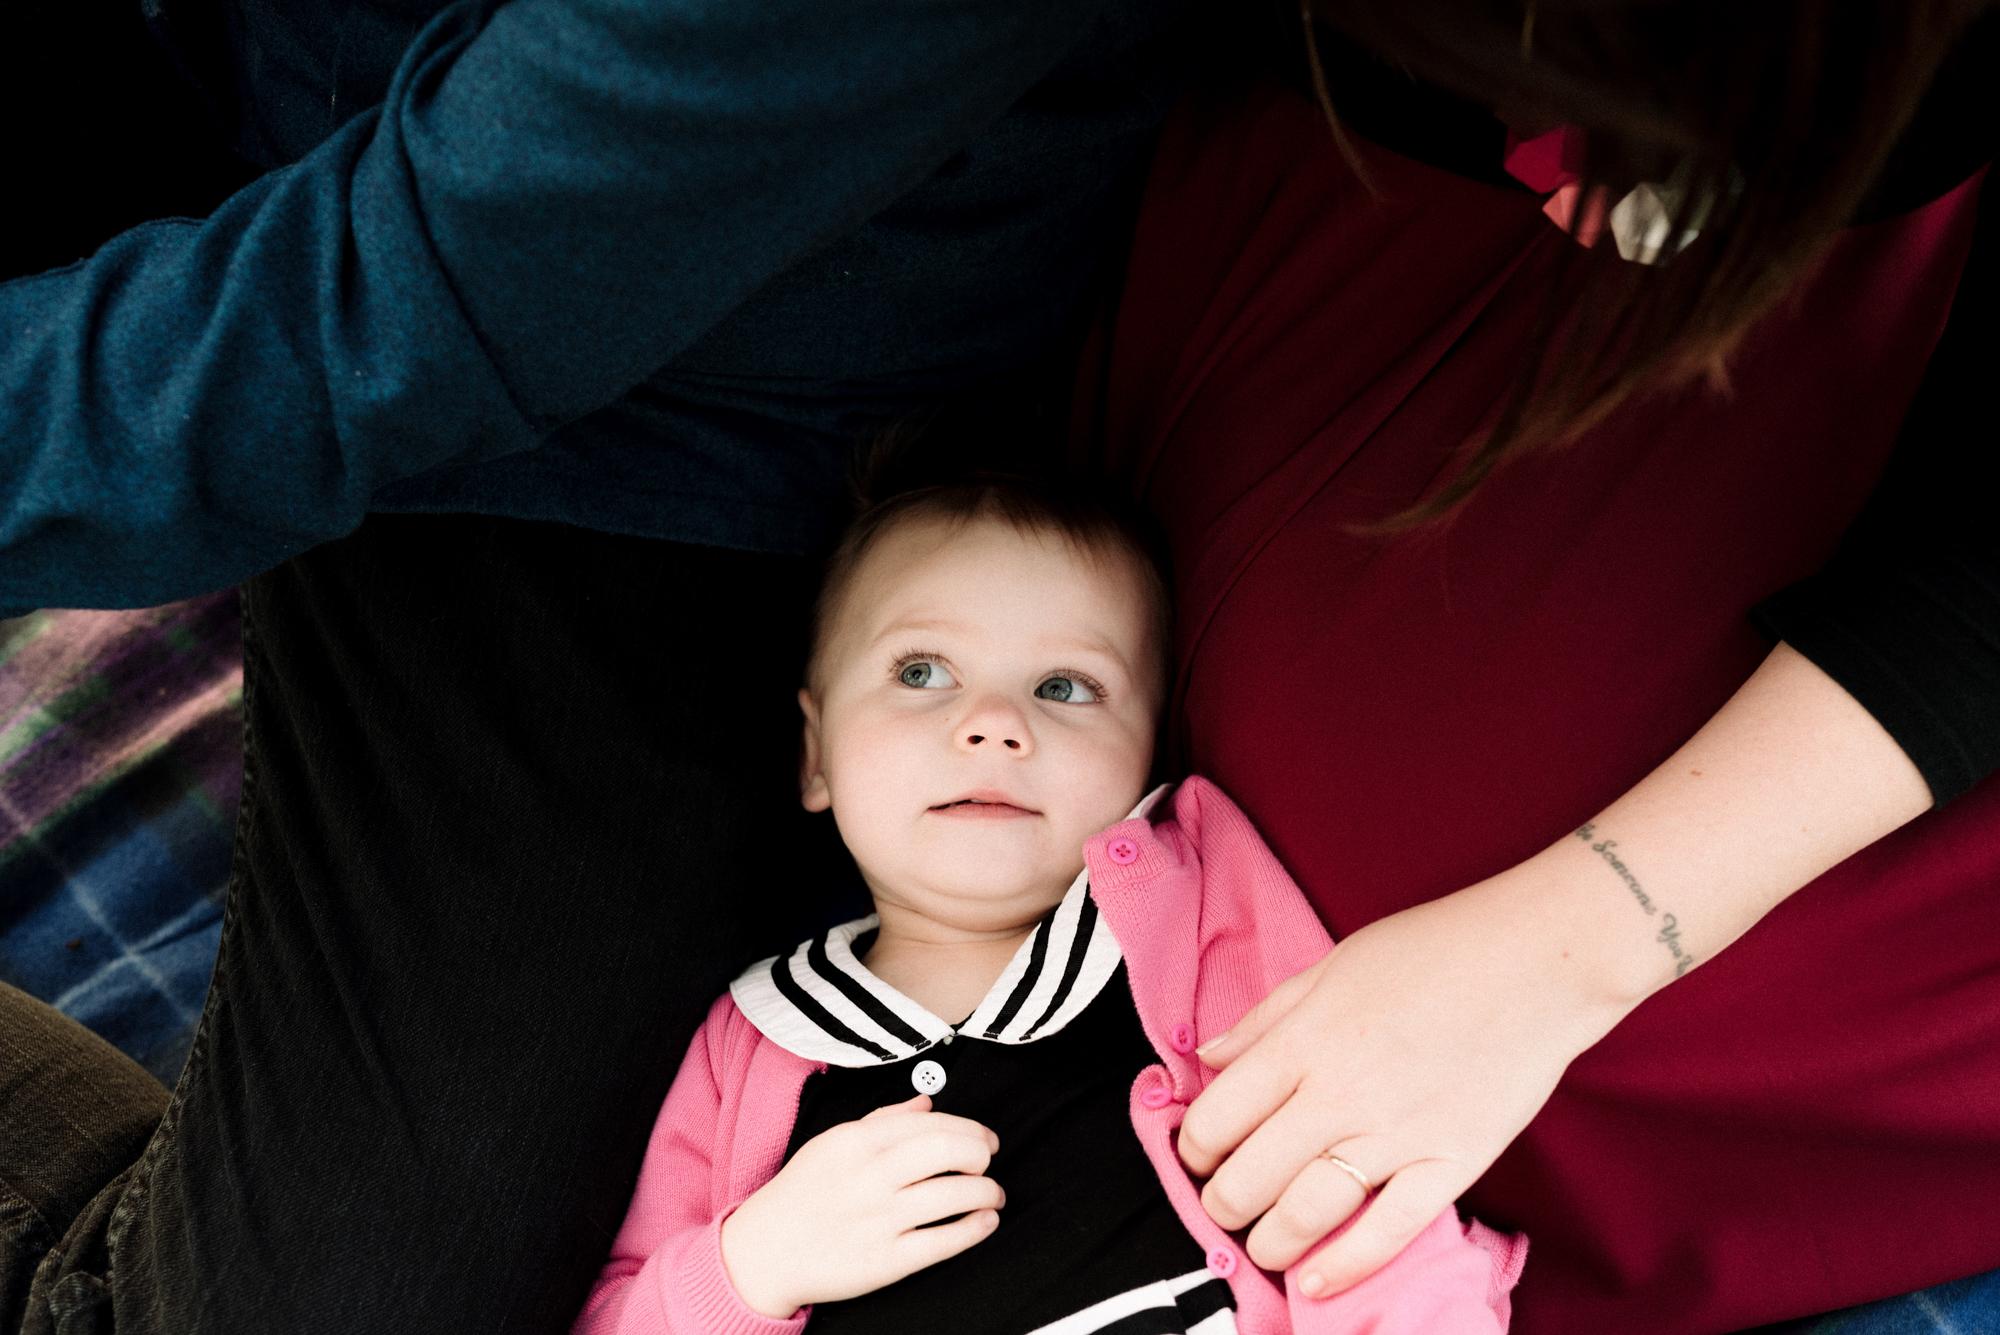 Cuddle time - family portrait session in Lafayette, CA